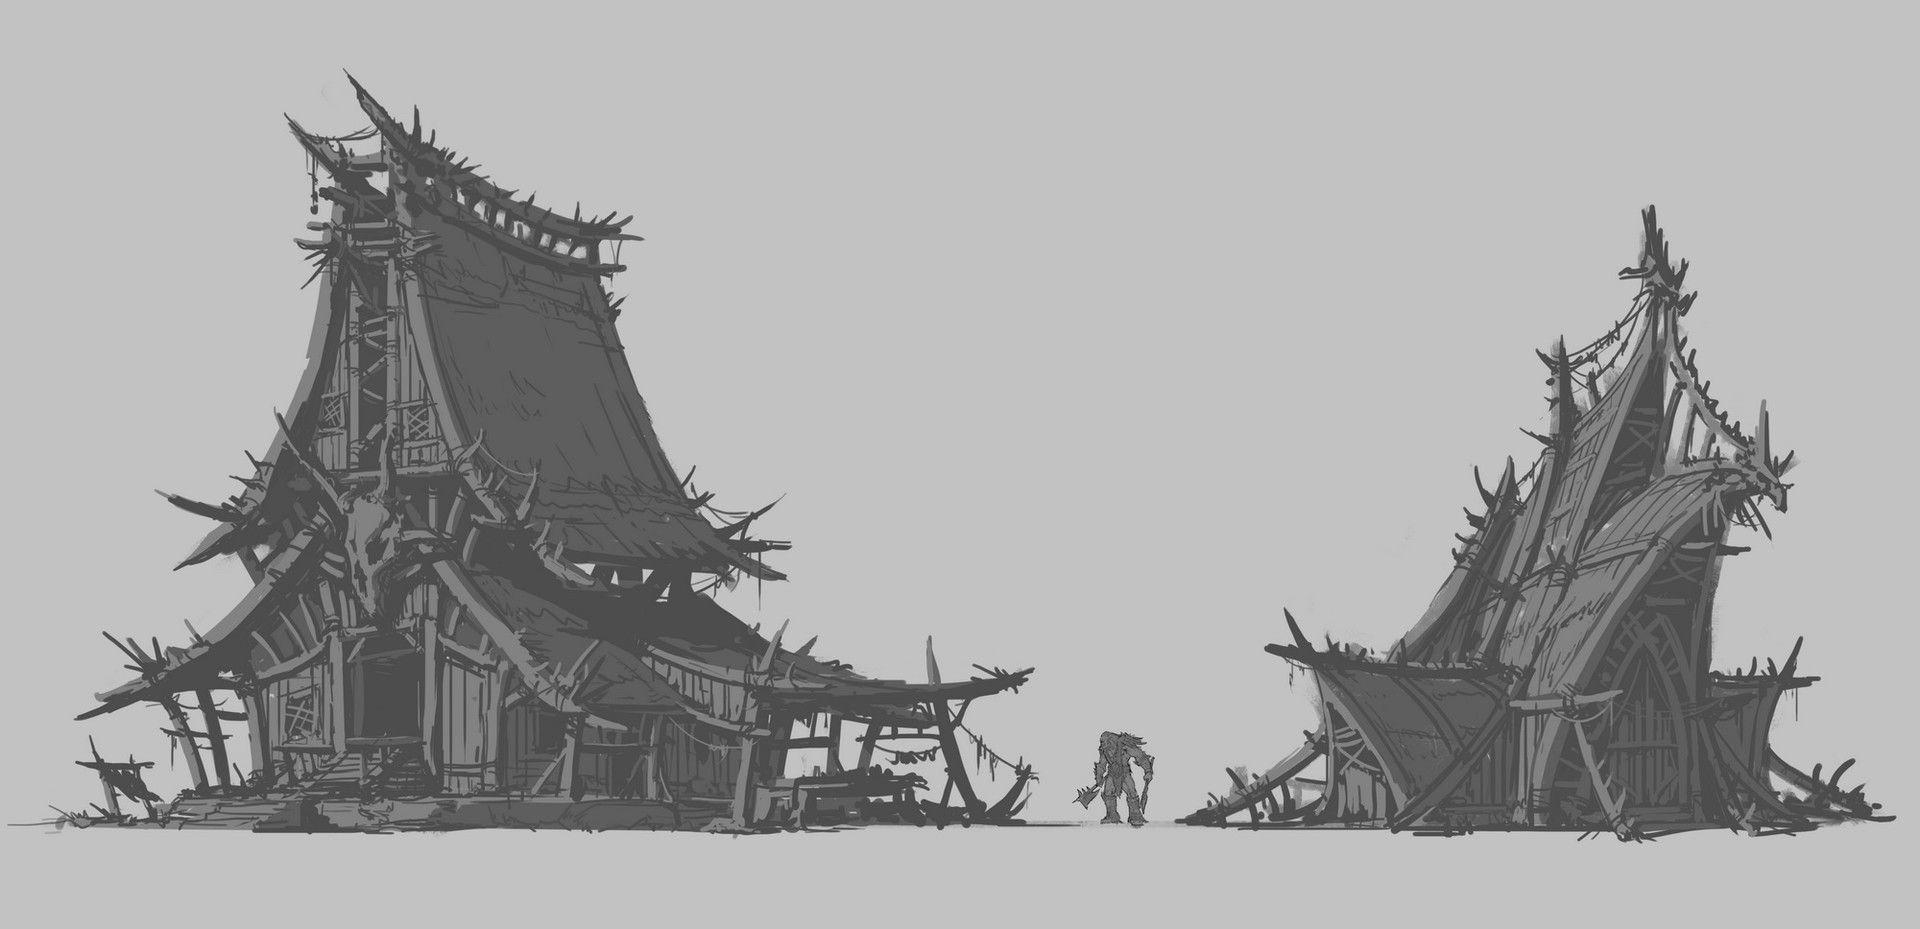 ArtStation - Some Orchish Designs (Thumbs), Earl Lan